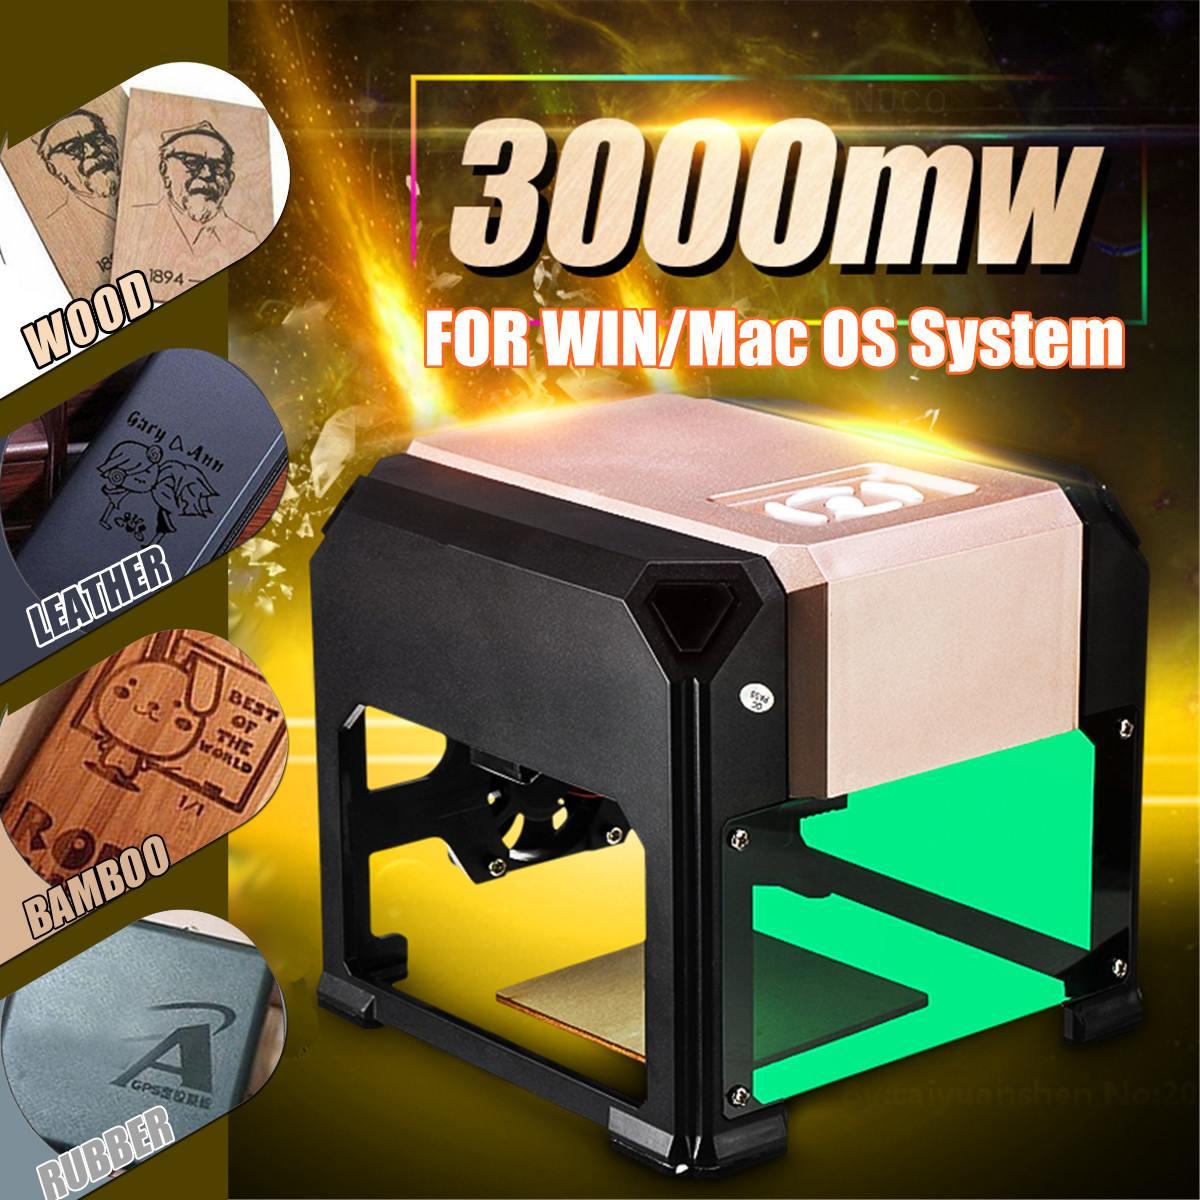 3000mW CNC Laser sculpture Machine bricolage sculpture graveur Compact bureau Laser gravure Machine Logo marque imprimante